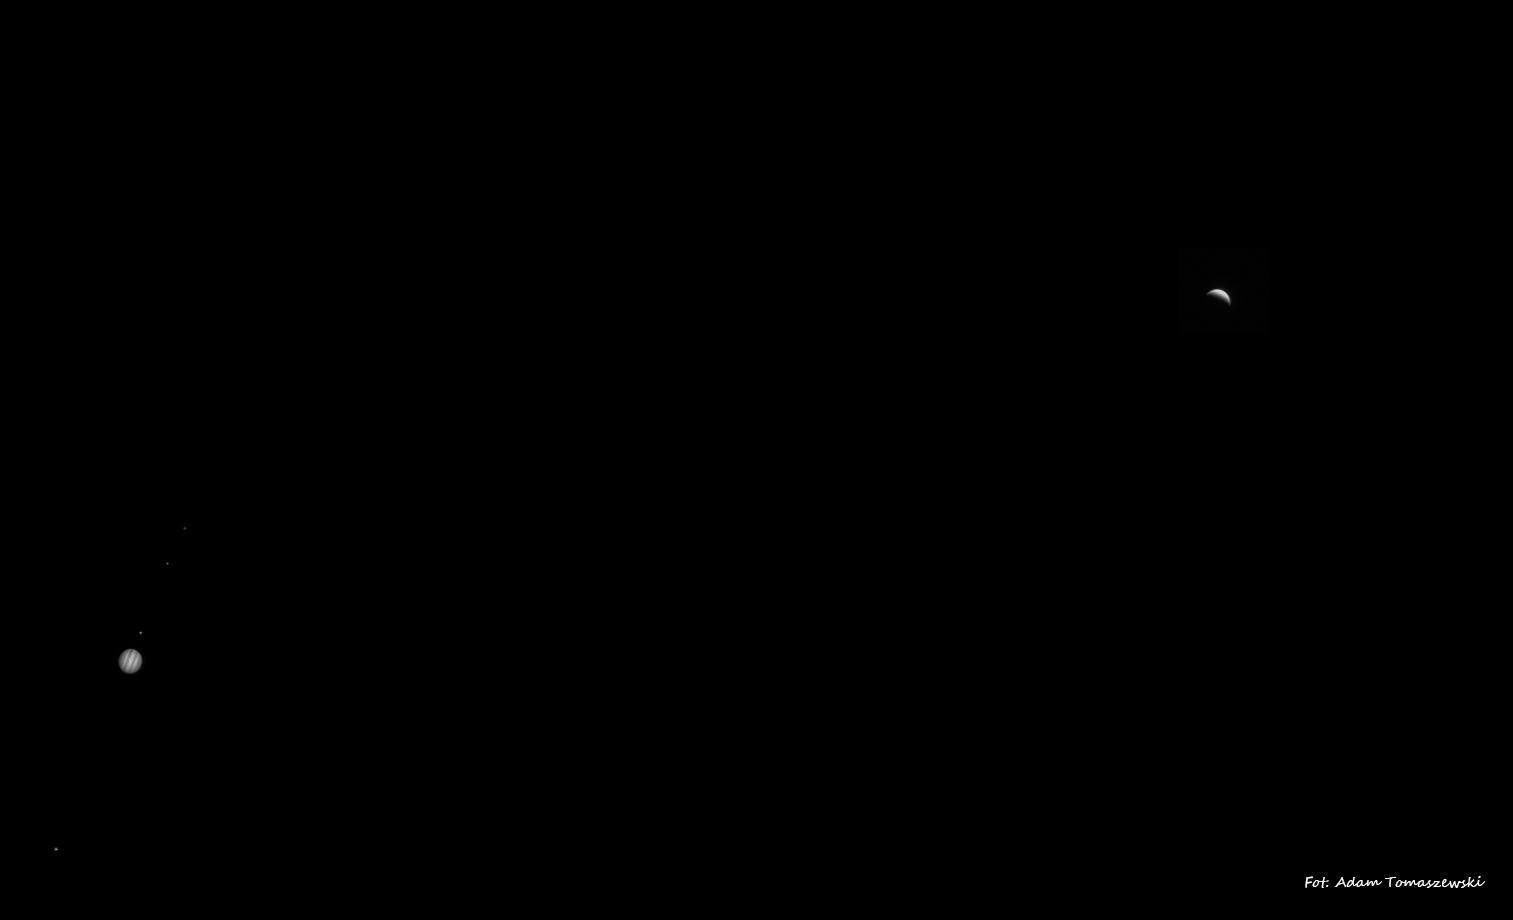 APOD: 2015 July 3 - Venus and Jupiter are Far